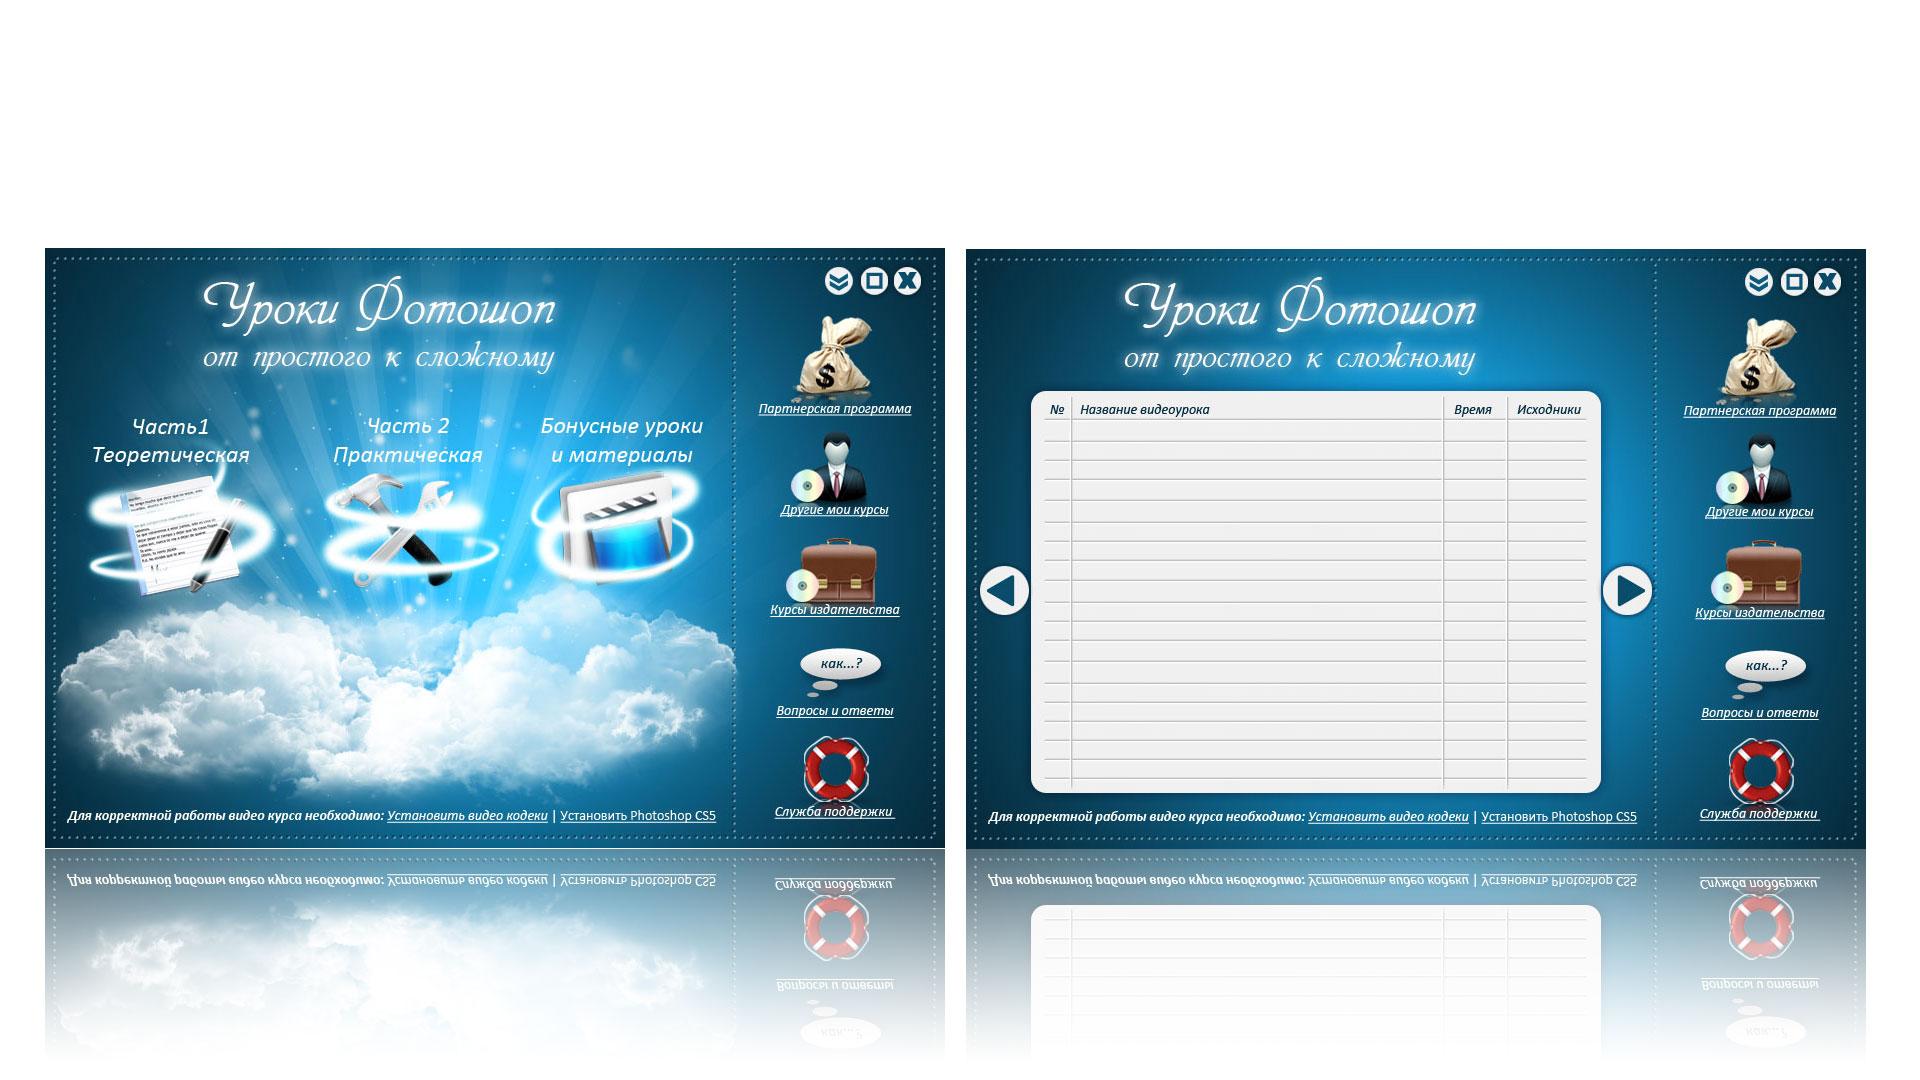 Создание дизайна DVD релиза (обложка, накатка, меню и т.п.) фото f_4d8dc575e47a2.jpg